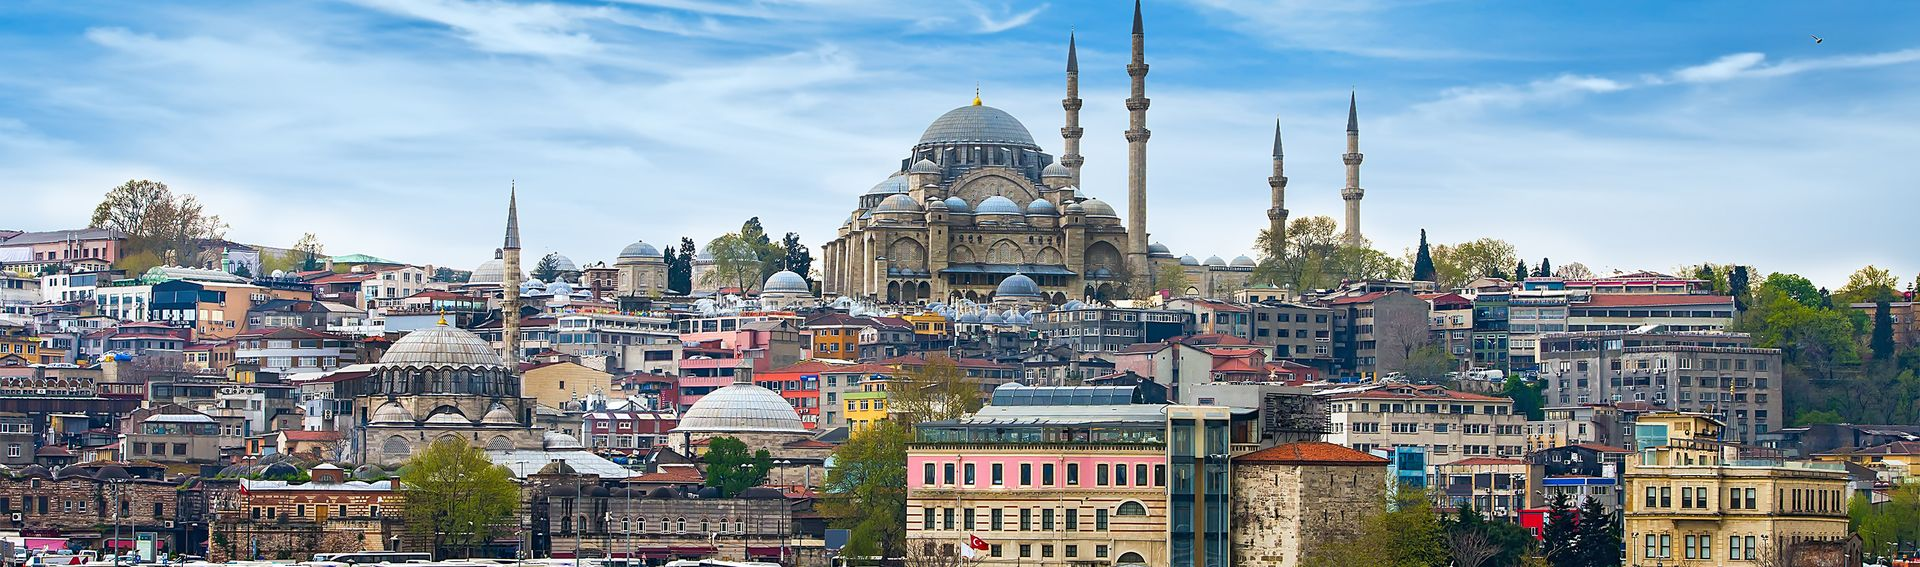 Turquie intérieure & Istanbul